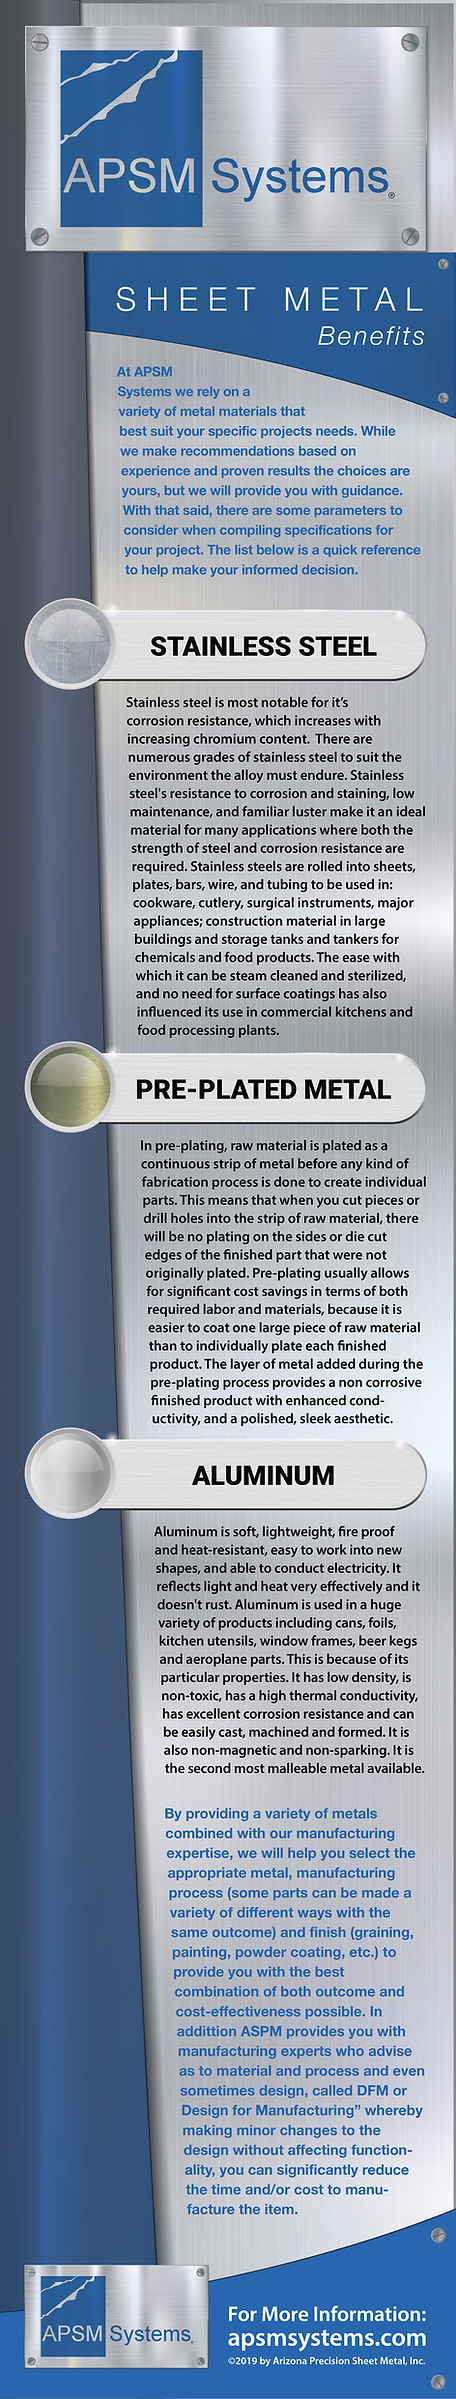 Sheet Metal Types - APSM Systems Infogra